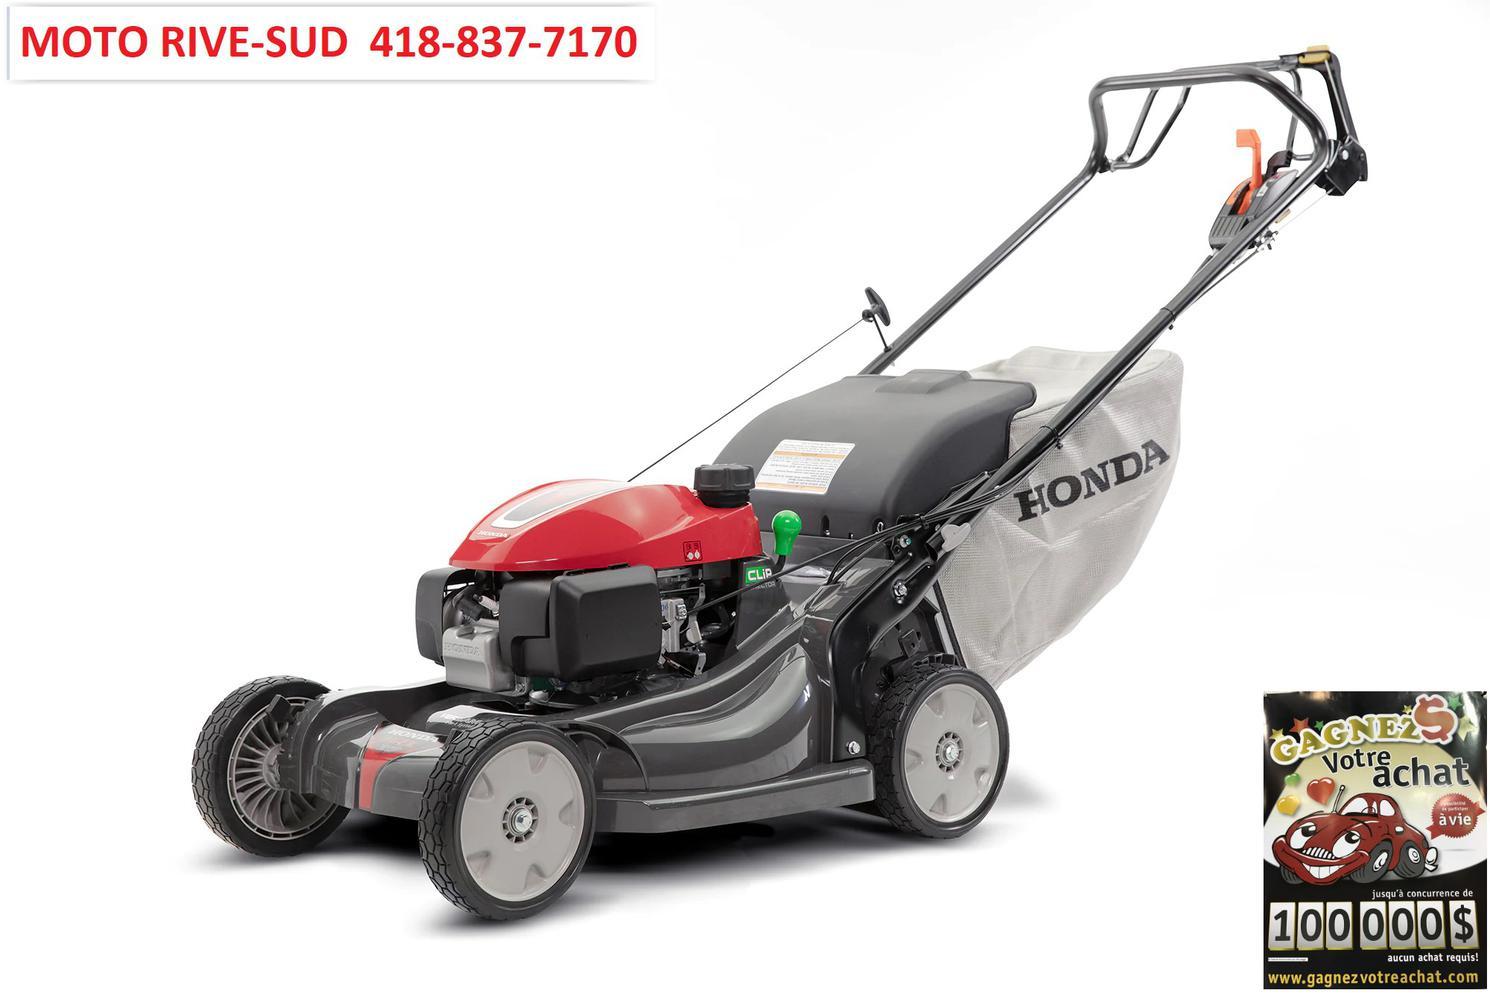 Honda HRX 217 HYC 2021 - AUTOMOTRICE